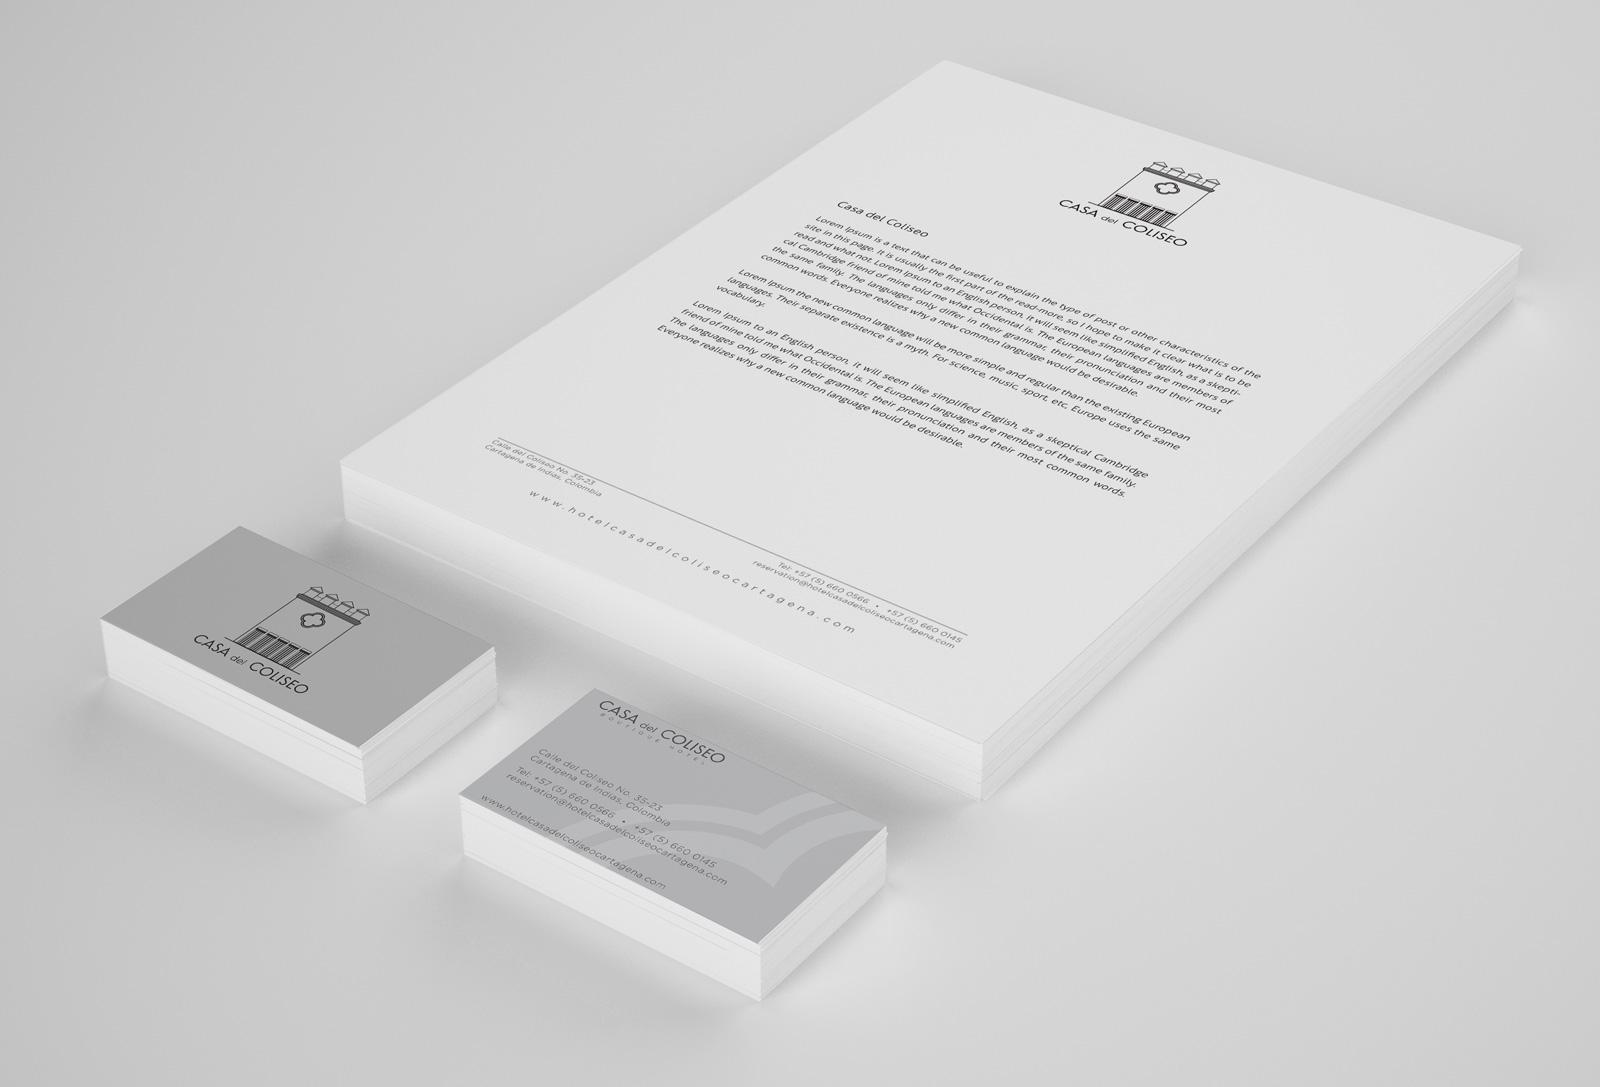 sublime-digital_branding_casa-del-coliseo-06